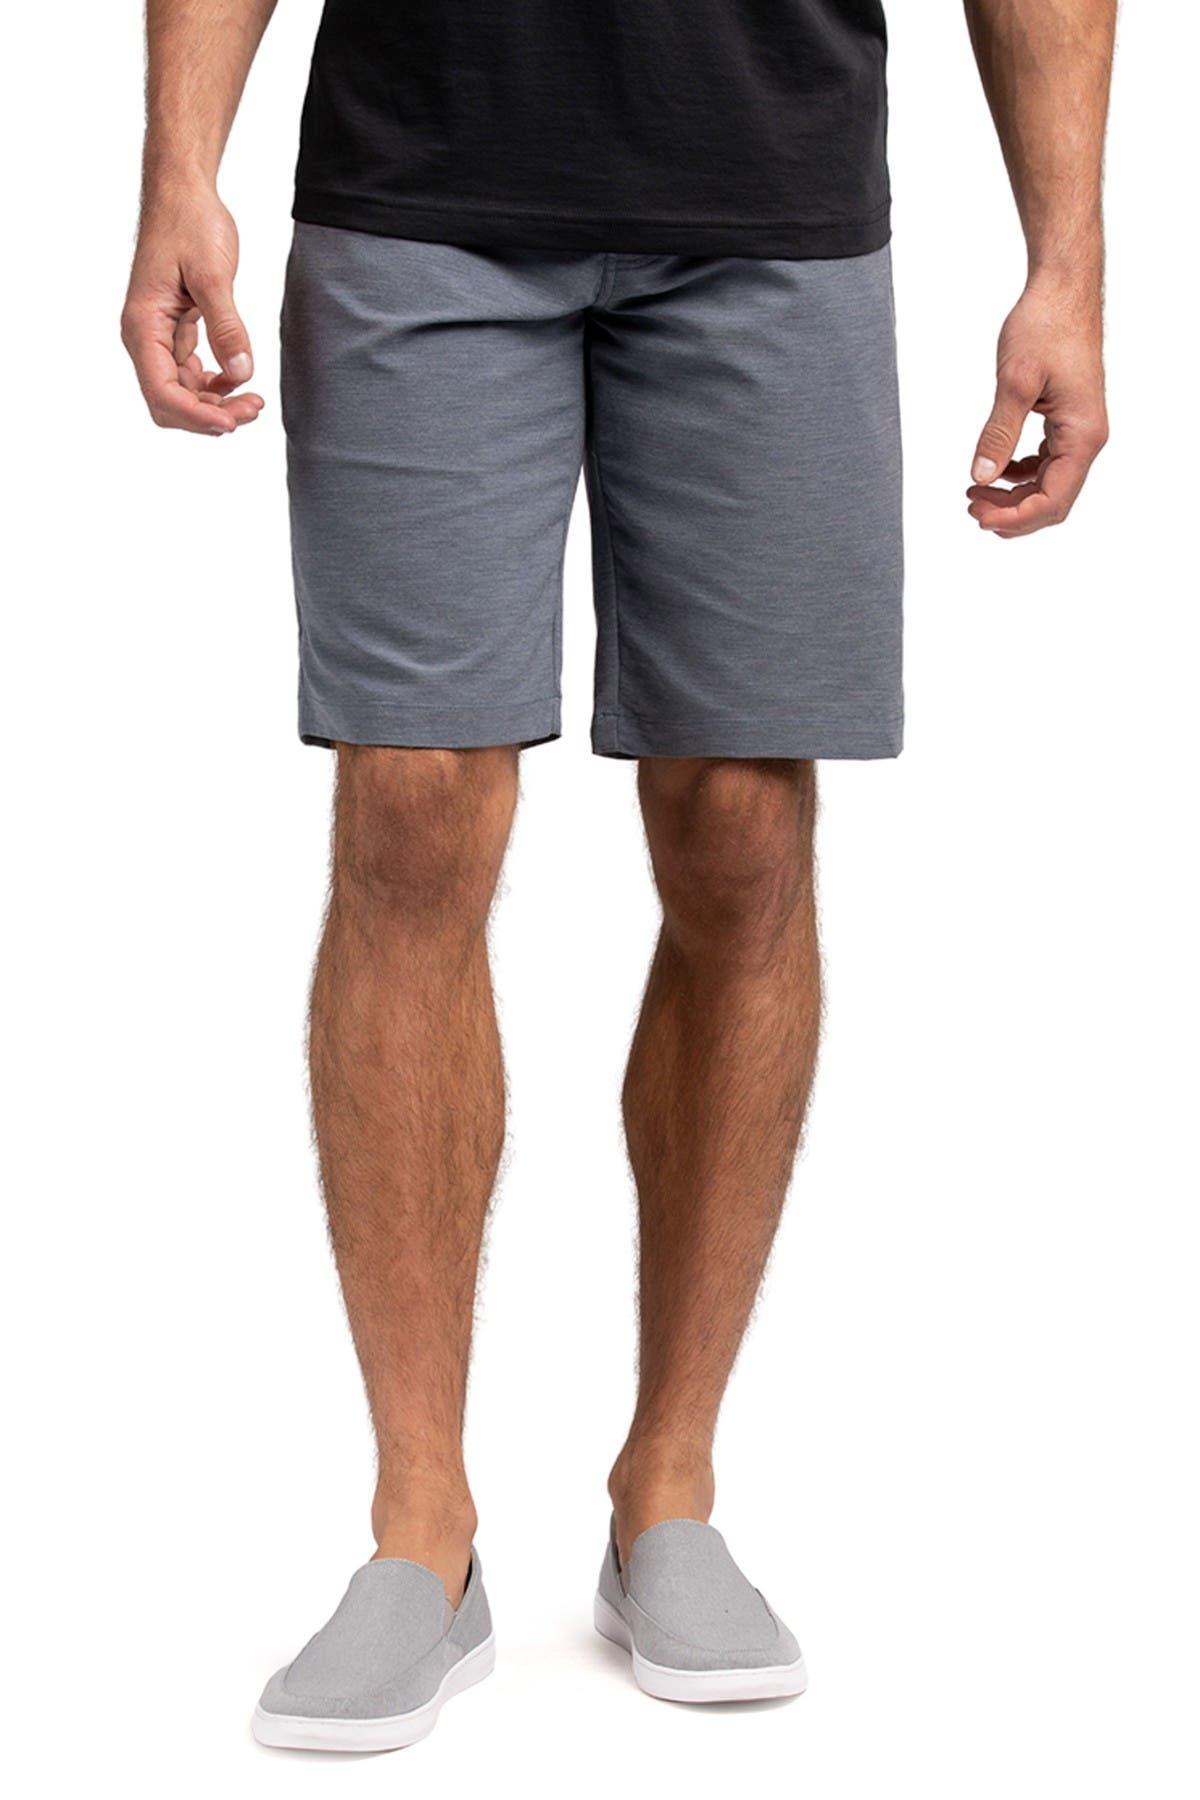 Image of TRAVIS MATHEW Cross Check Shorts